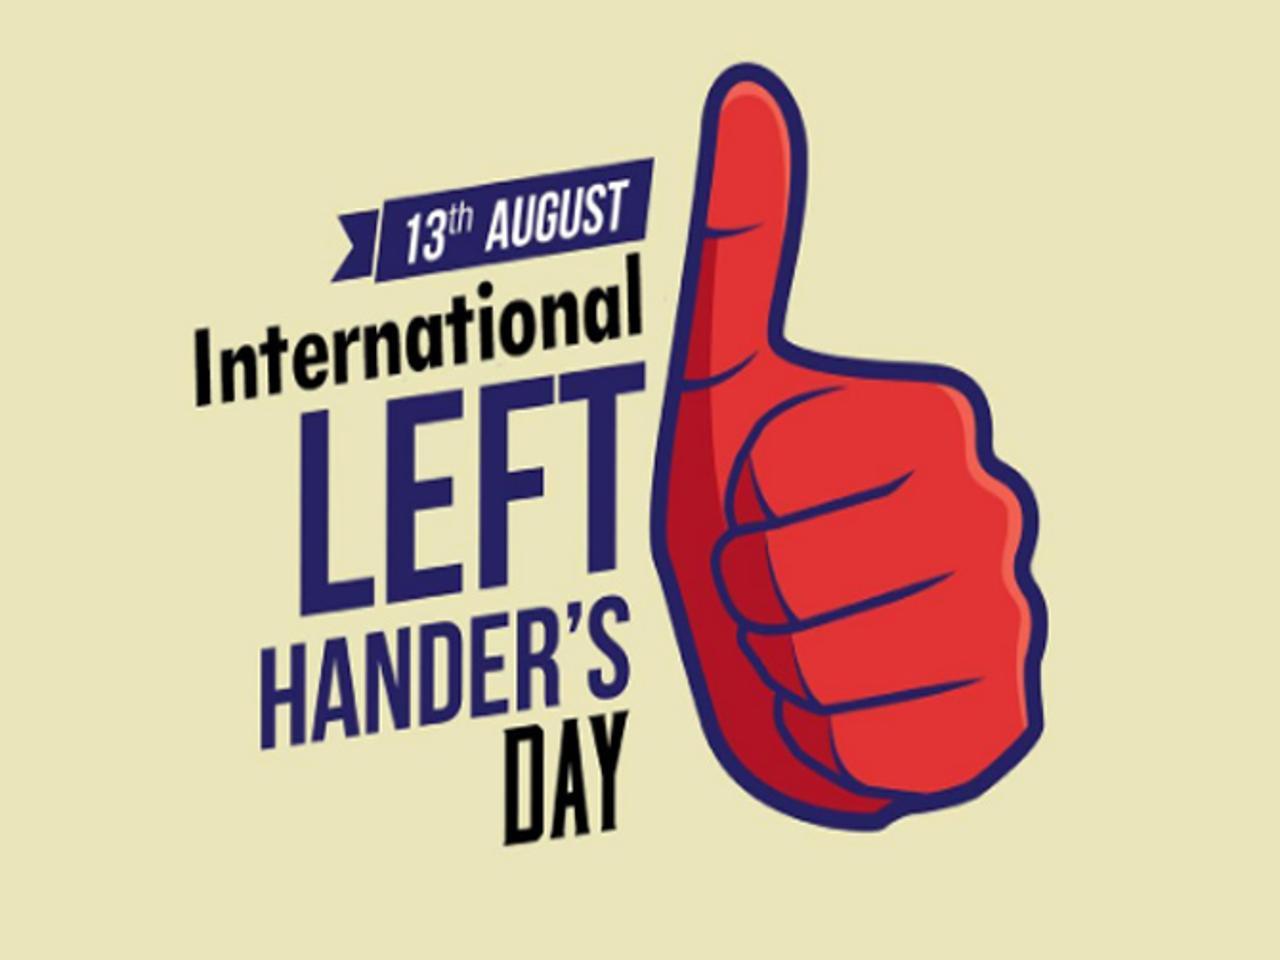 International Lefthanders Day: 13 August  അന്താരാഷ്ട്ര ഇടംകൈയ്യരുടെ ദിനം: 13 ഓഗസ്റ്റ്_40.1